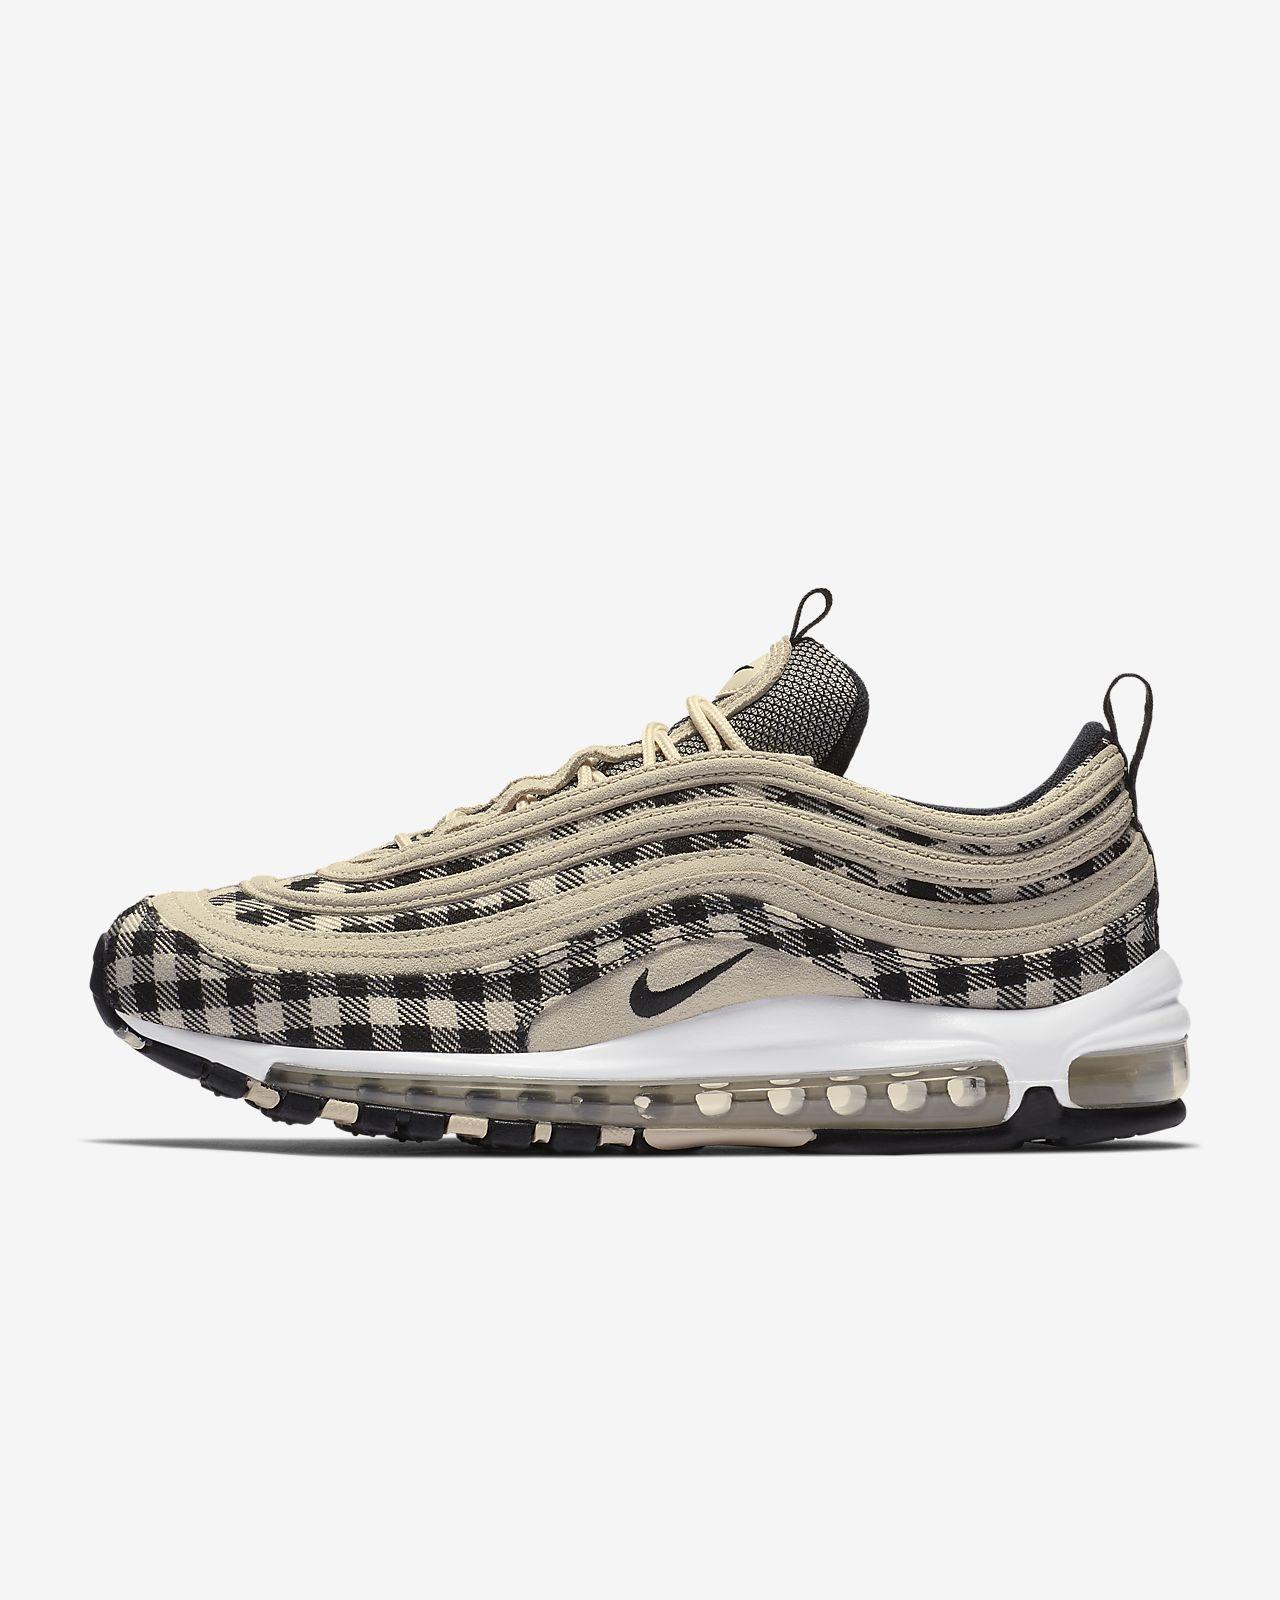 Air 97 Nike Max Vn Men's Shoe Premium 87zdOOw0q